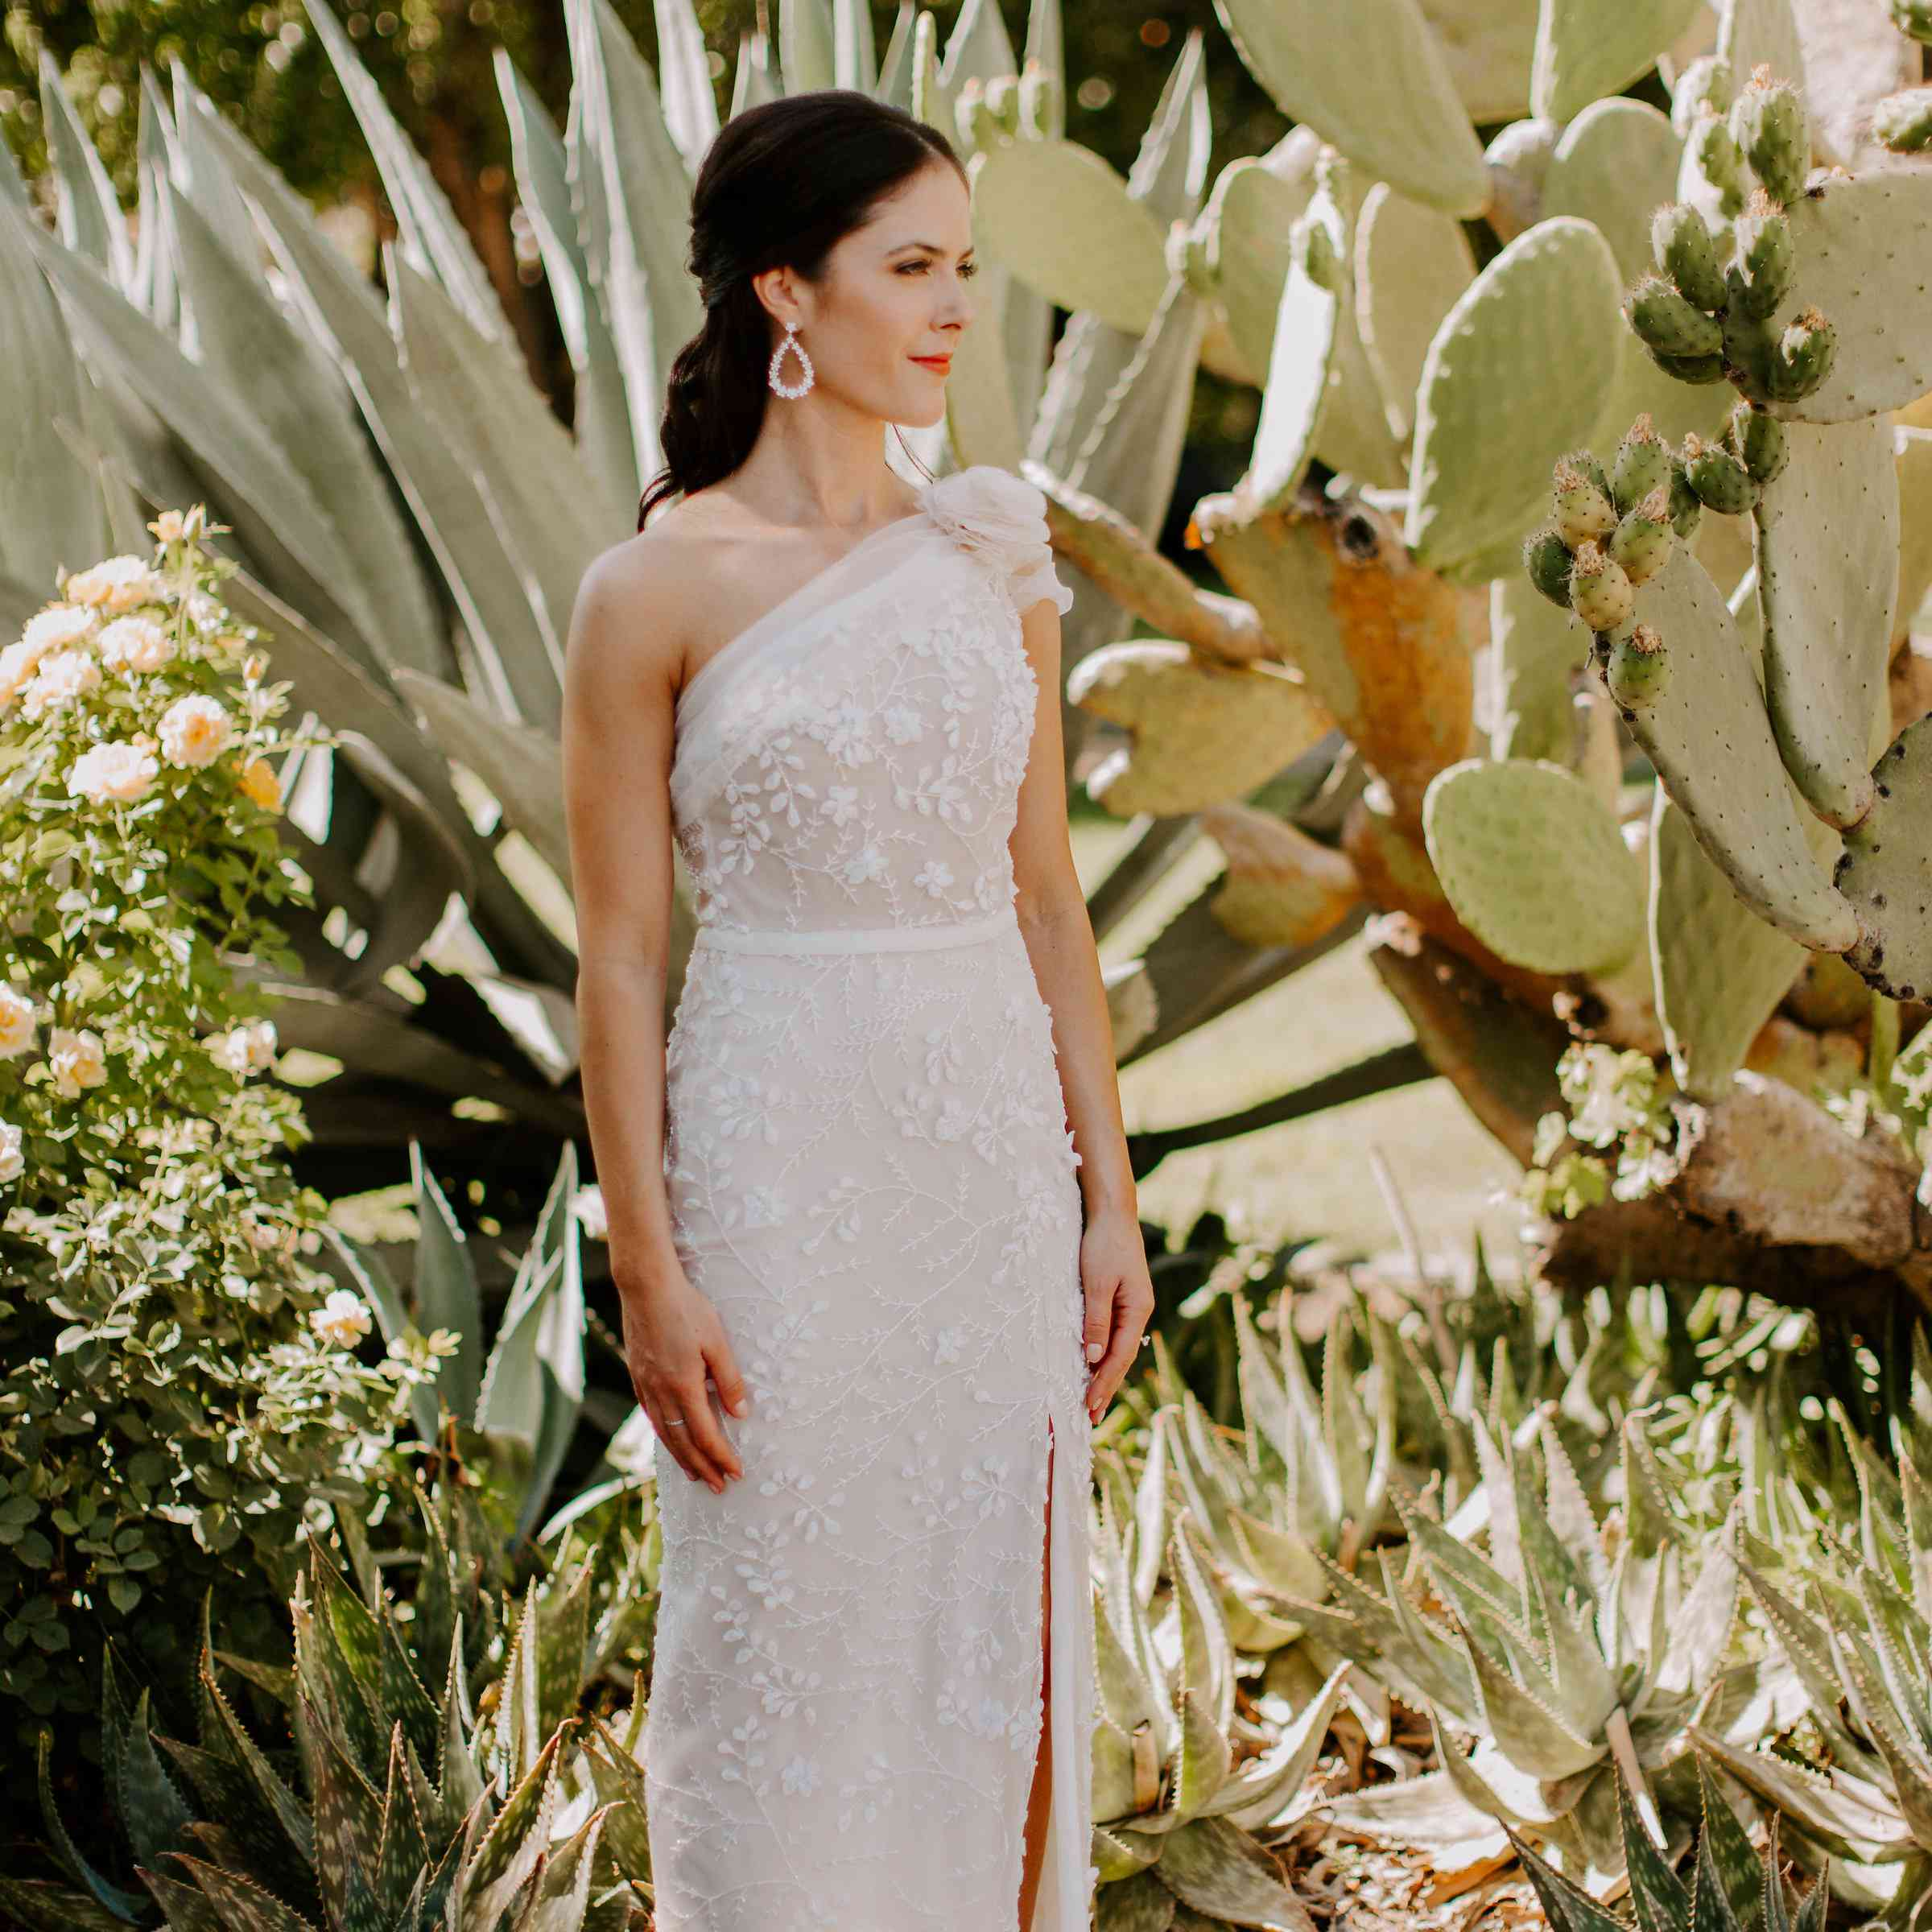 <p>bride one-shoulder wedding dress</p><br><br>